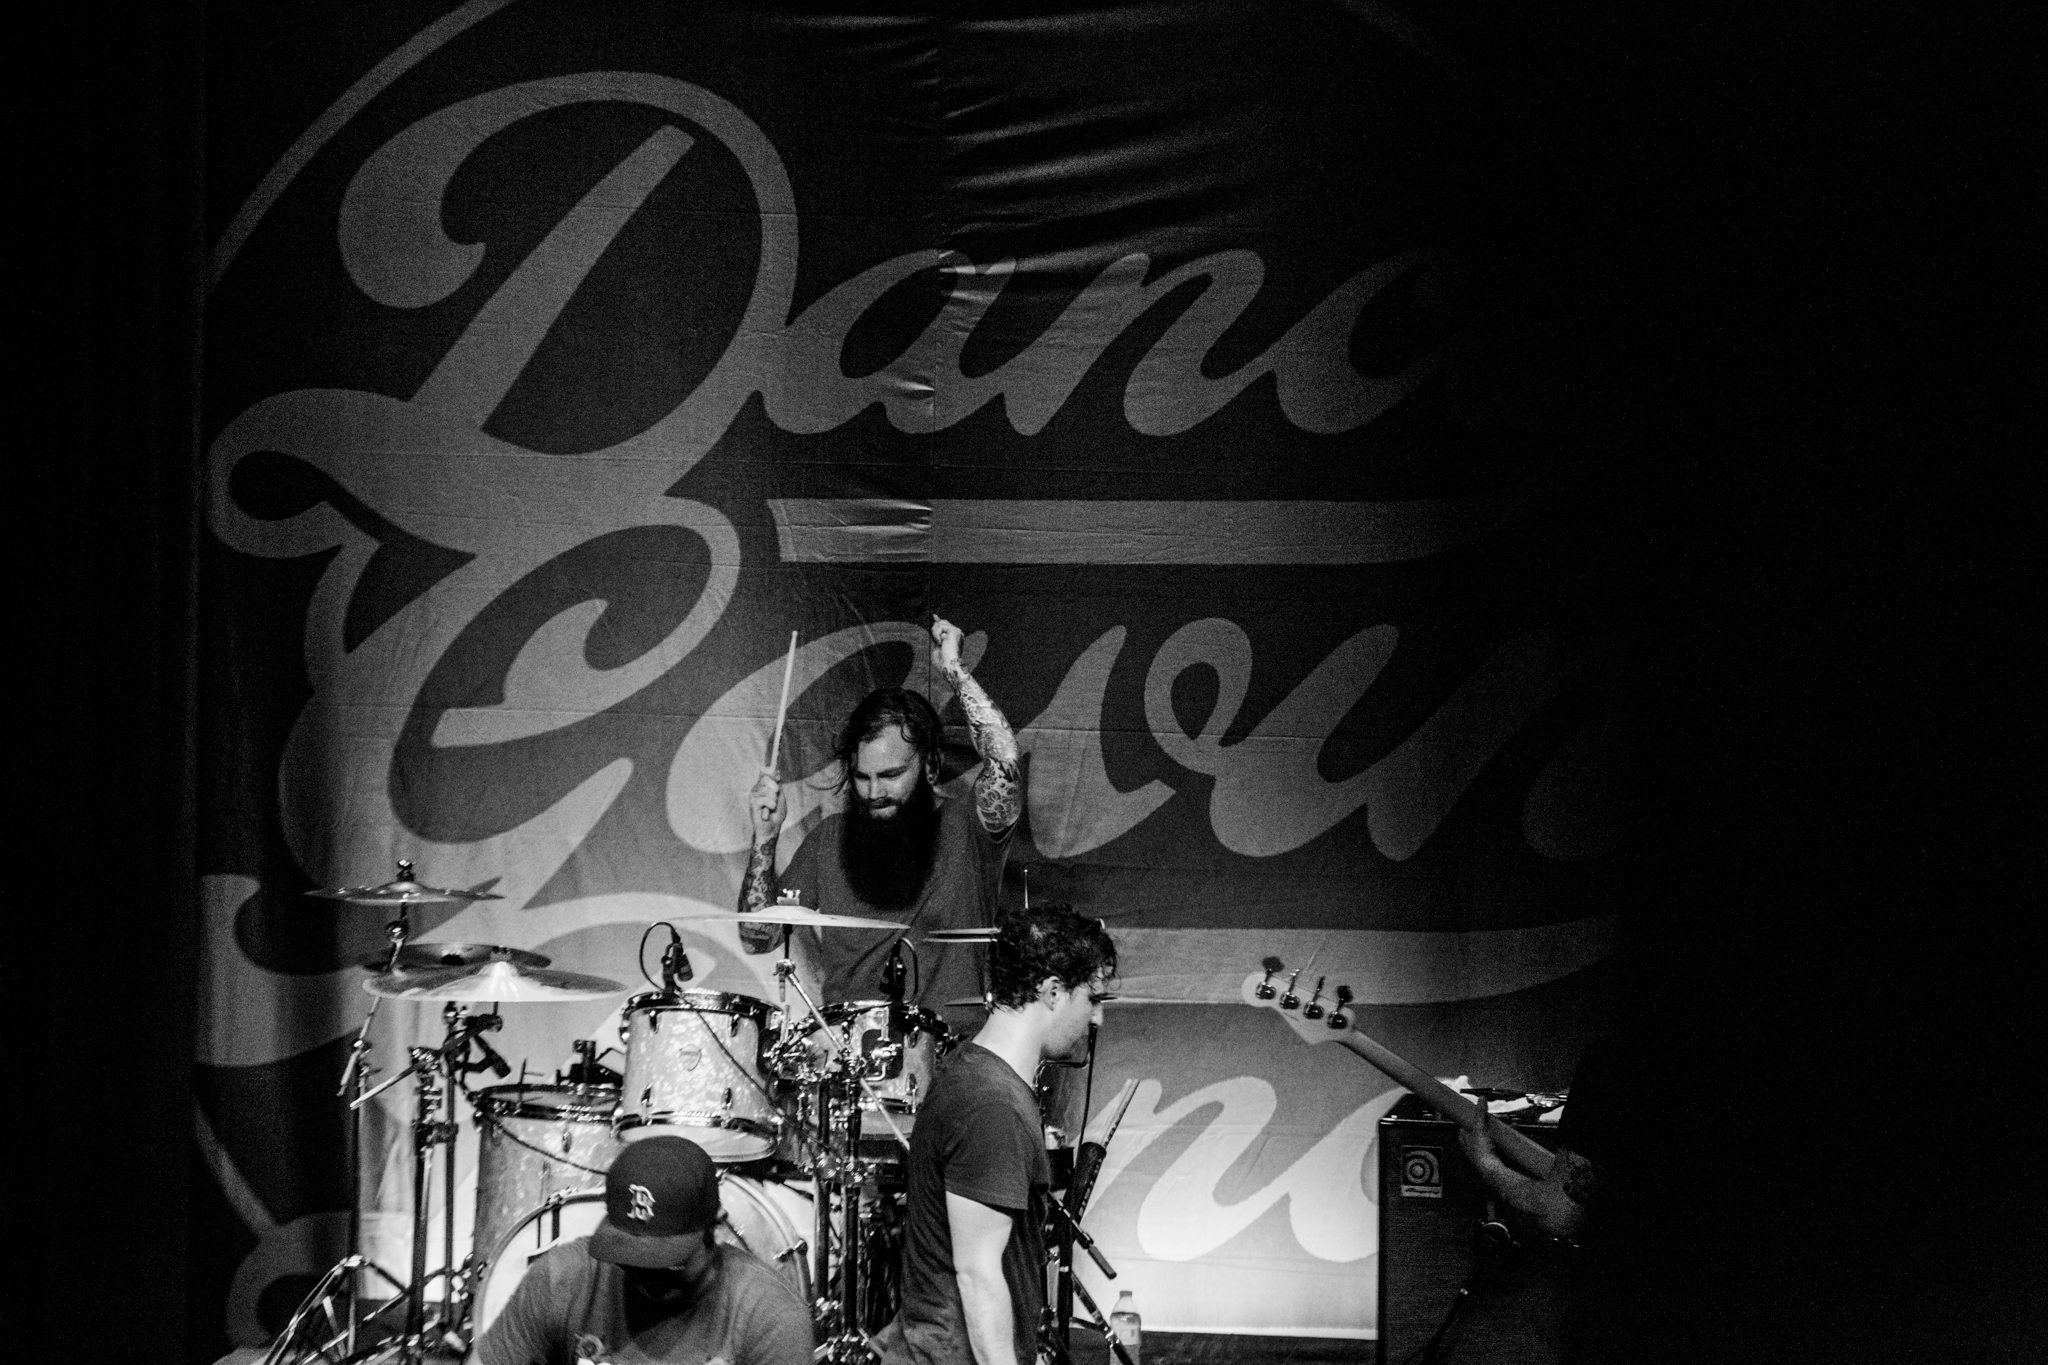 Lafferty Photo - Dance Gavin Dance 03.08.17-8902.jpg